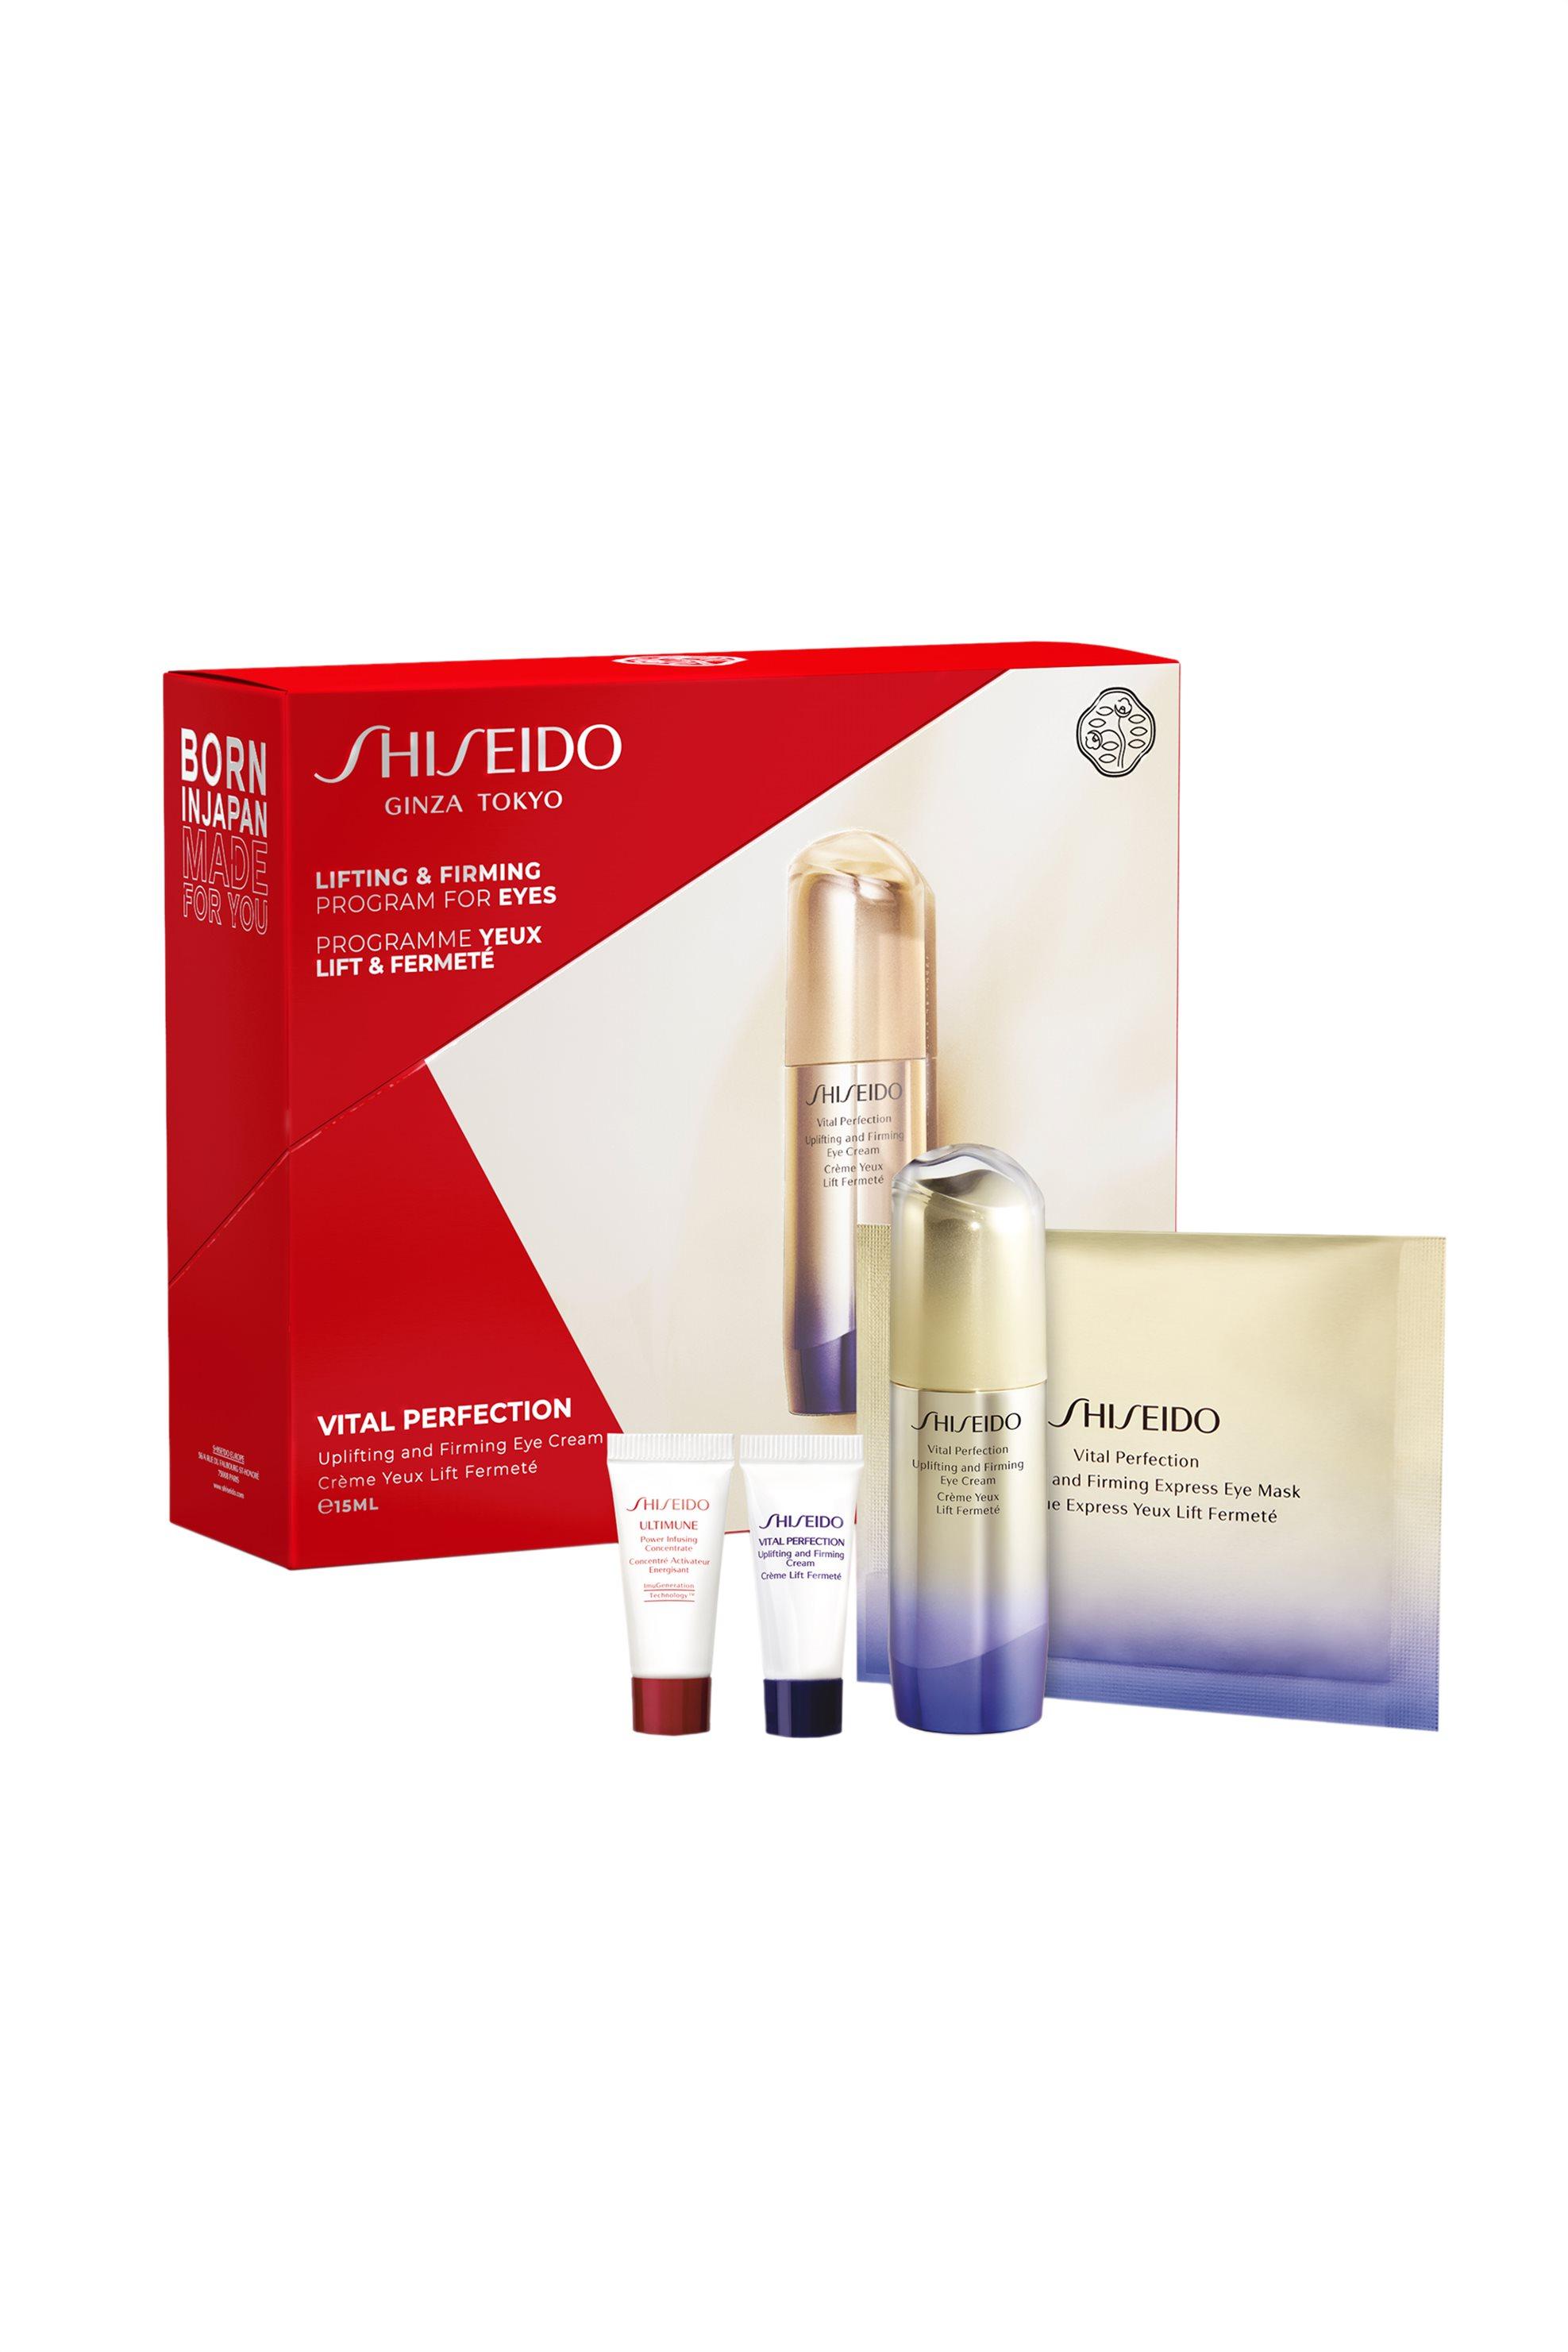 Shiseido Vital Perfection Uplifting and Firming Eye Cream Care Set - 95583